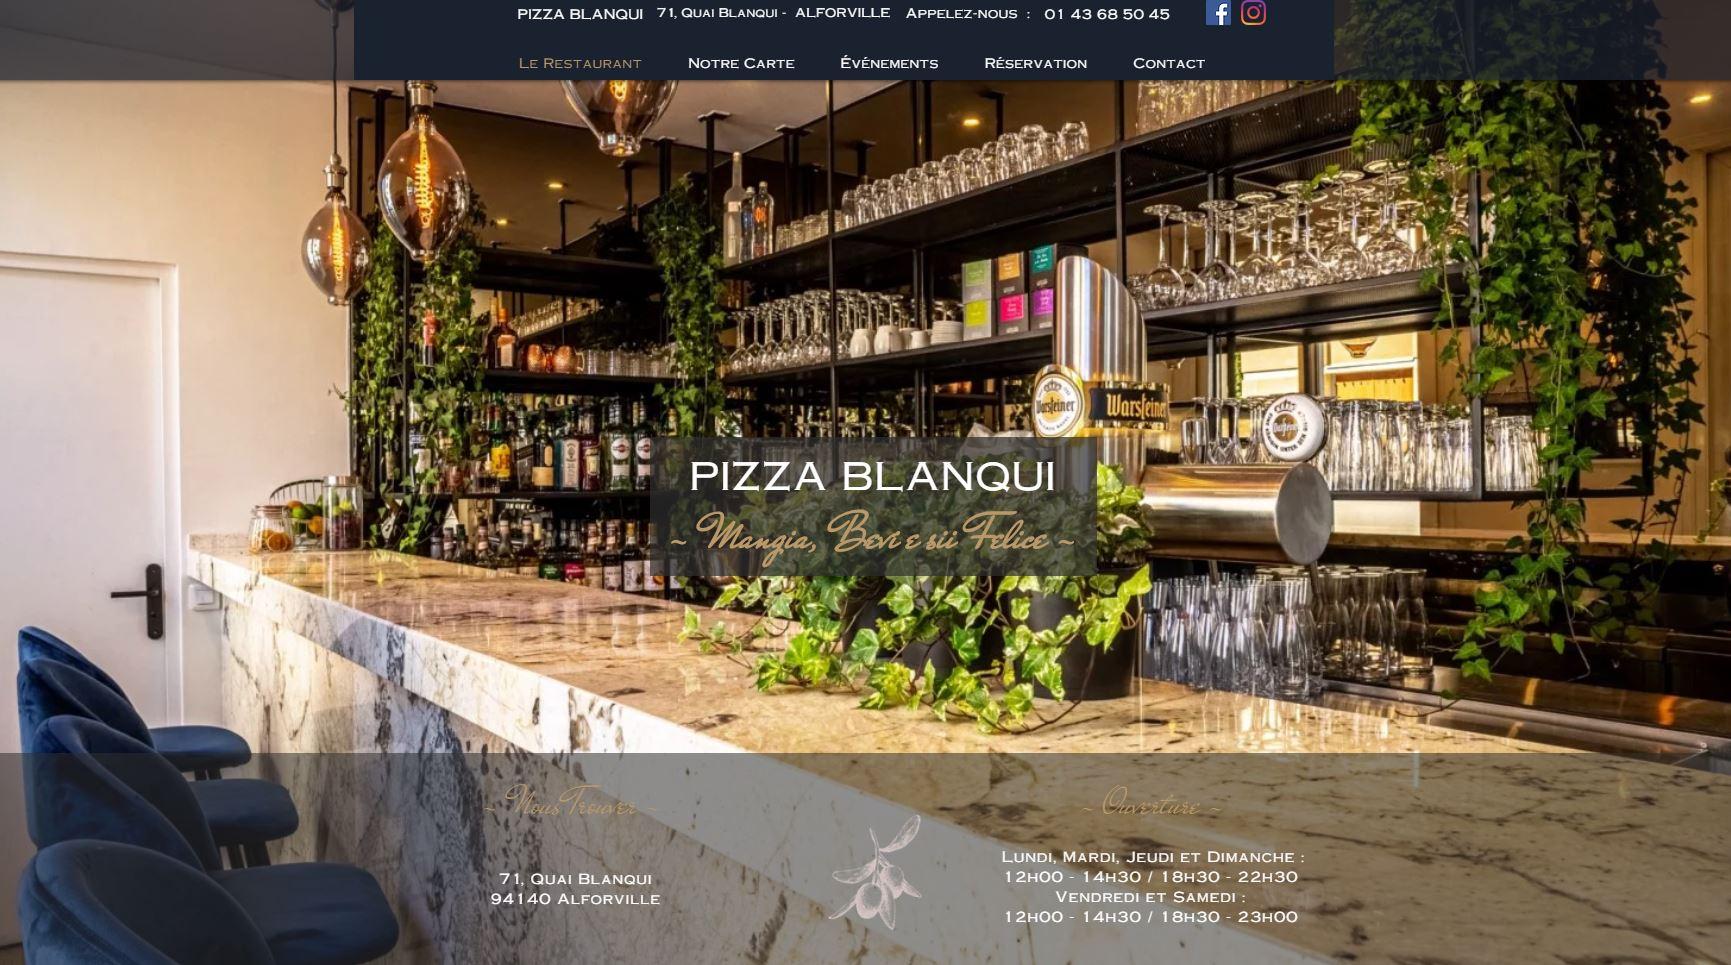 www.pizzablanqui.fr